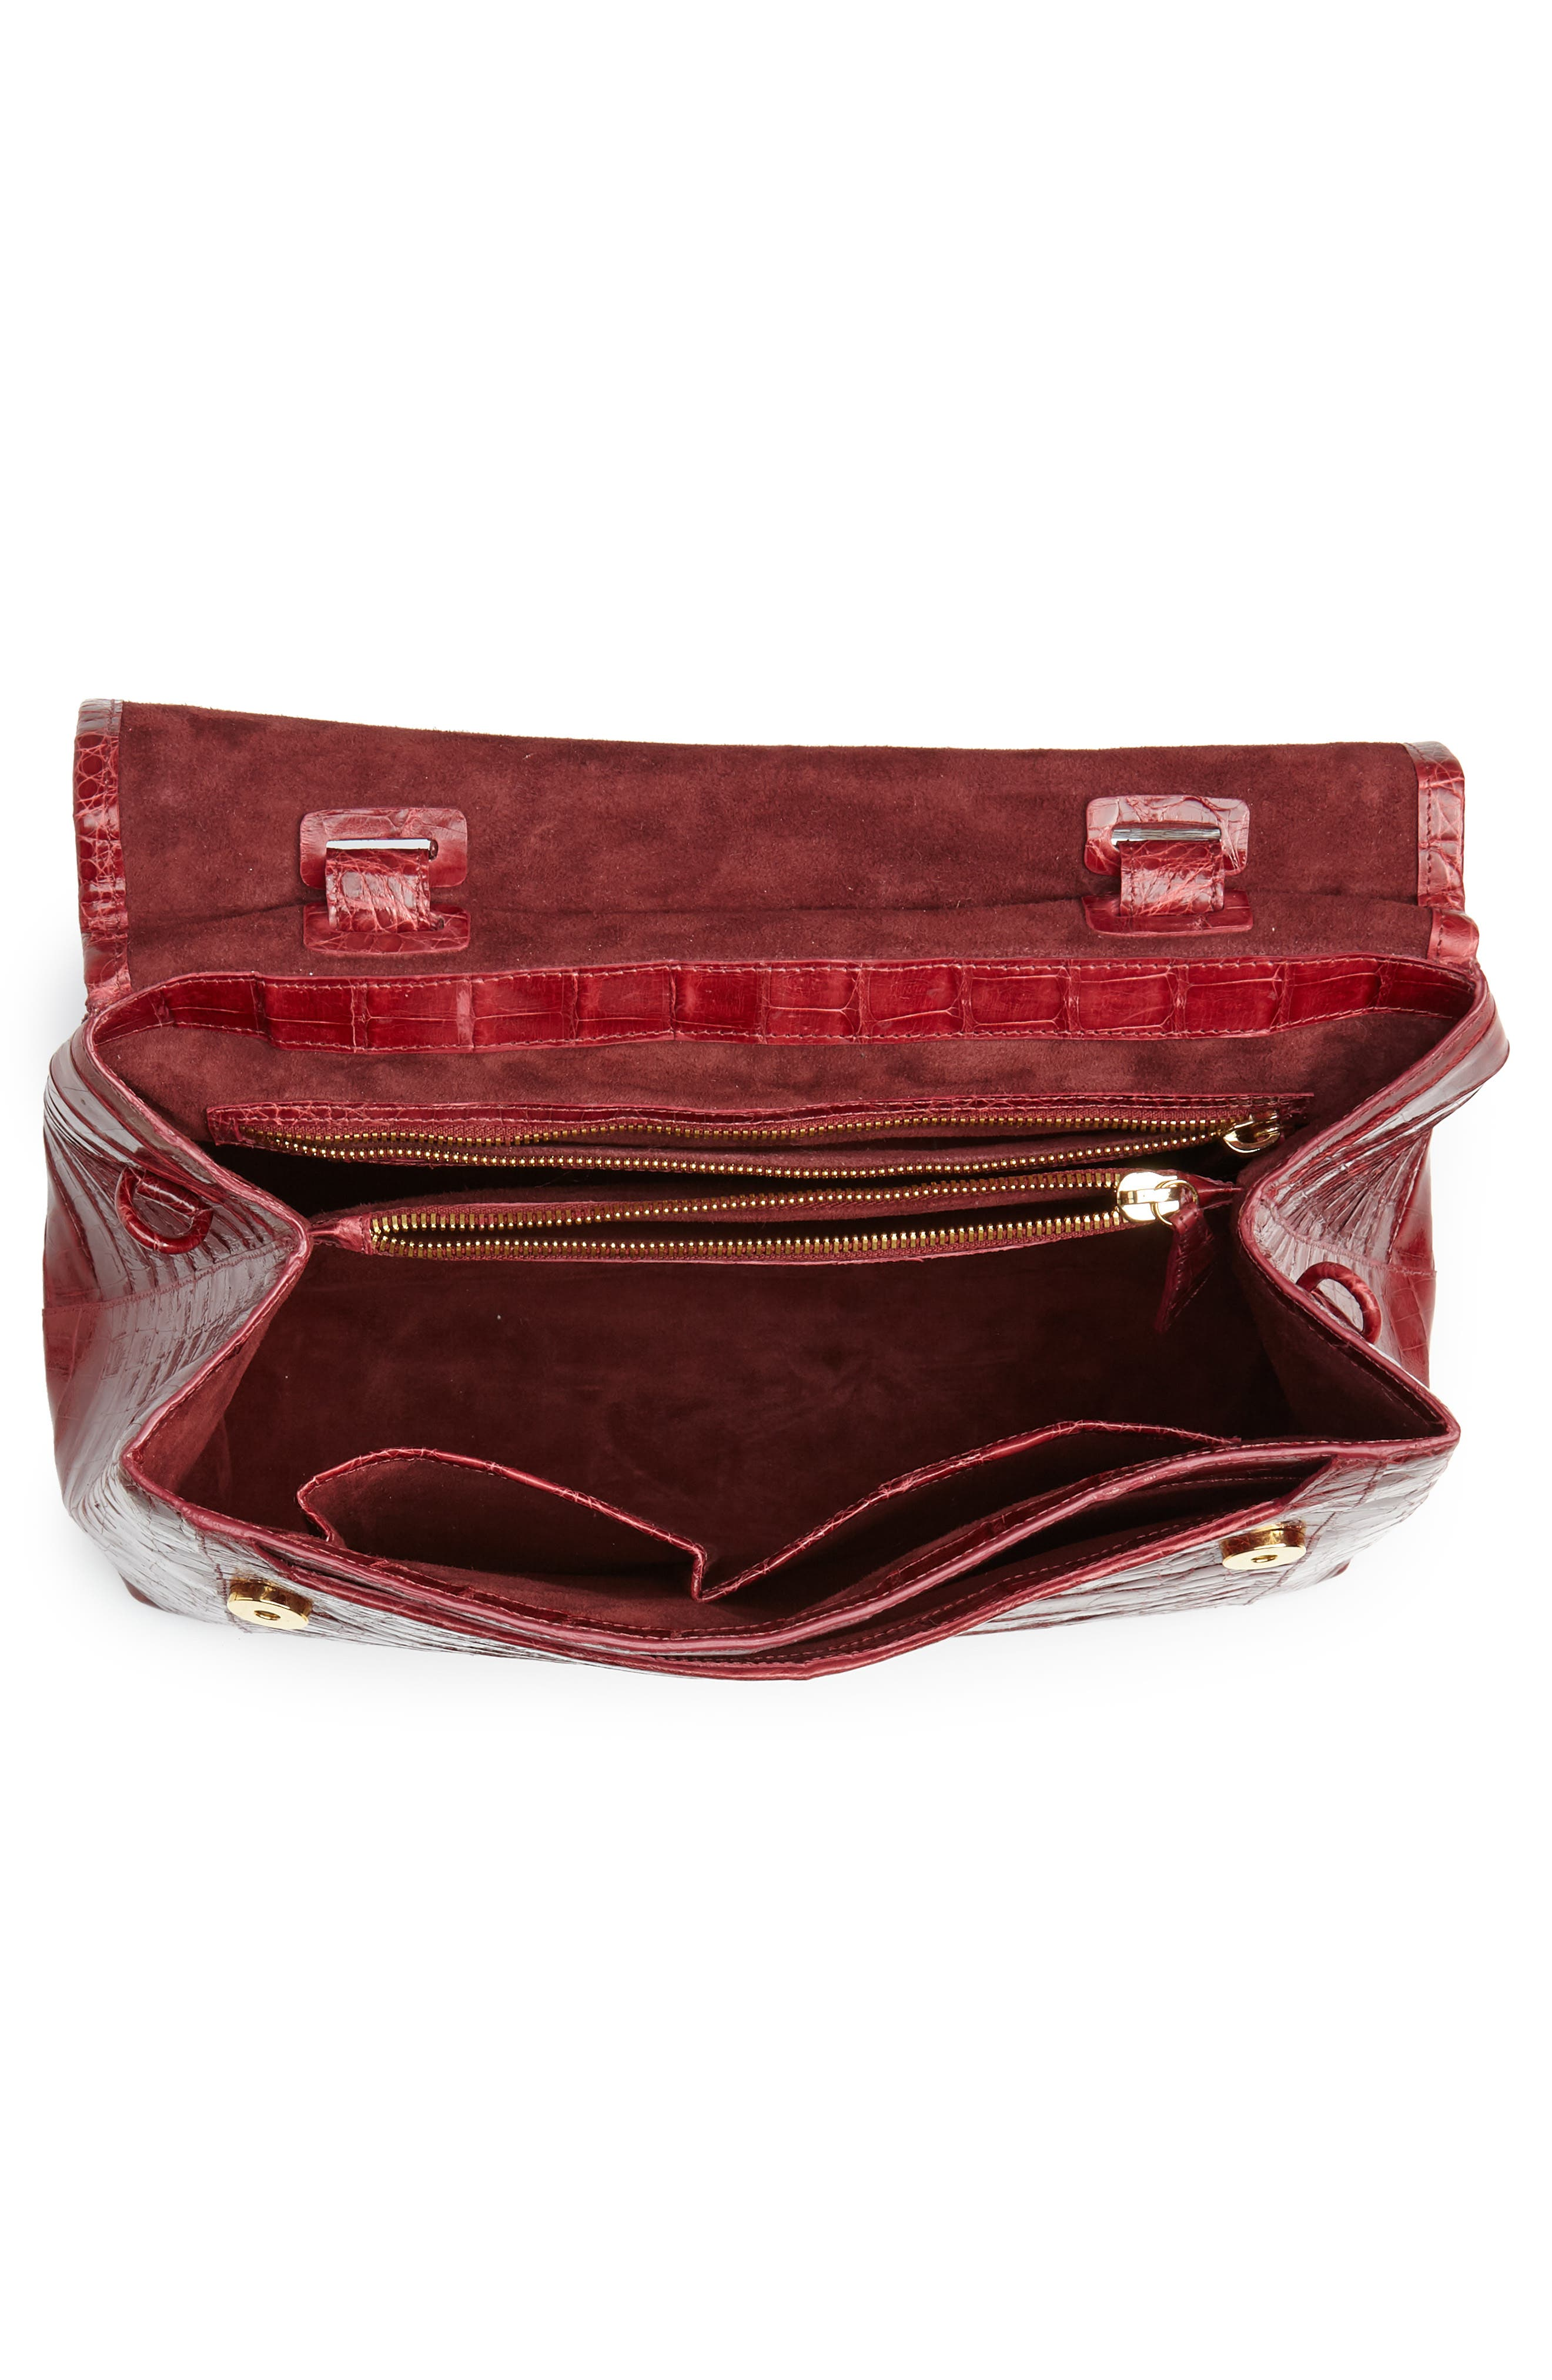 Medium Sophie Genuine Crocodile Top Handle Bag,                             Alternate thumbnail 4, color,                             RED SHINY